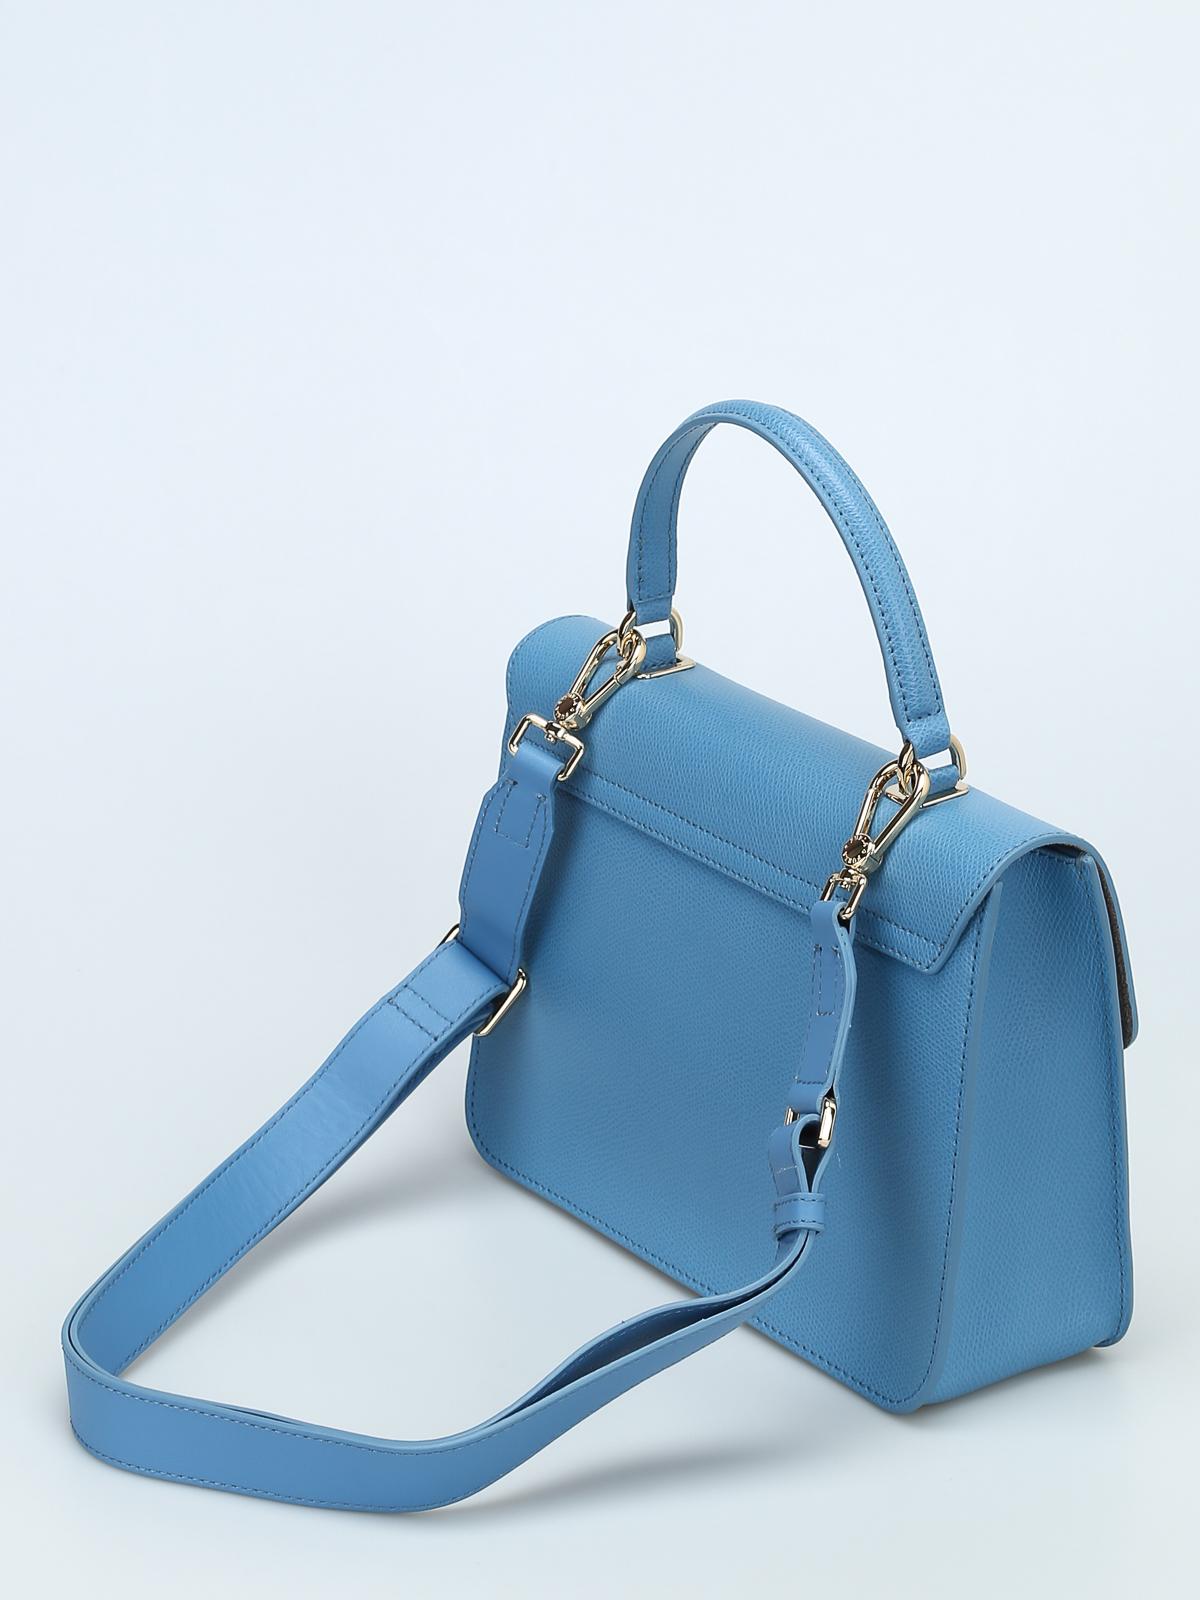 Ikrix Furla Cross Body Bags Metropolis S Sky Blue Leather Bag